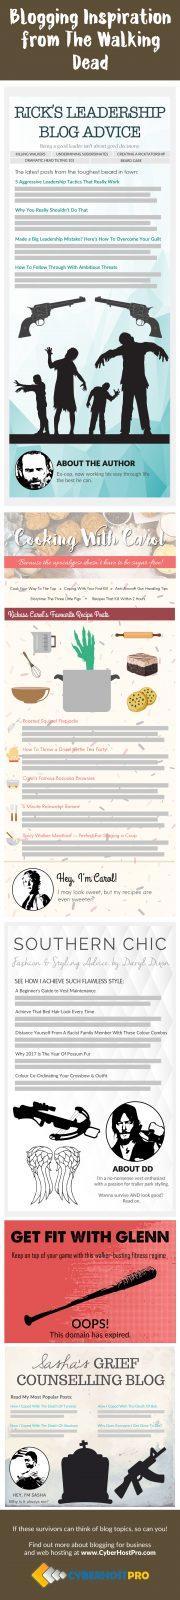 Walking Dead blog inspiration infographic